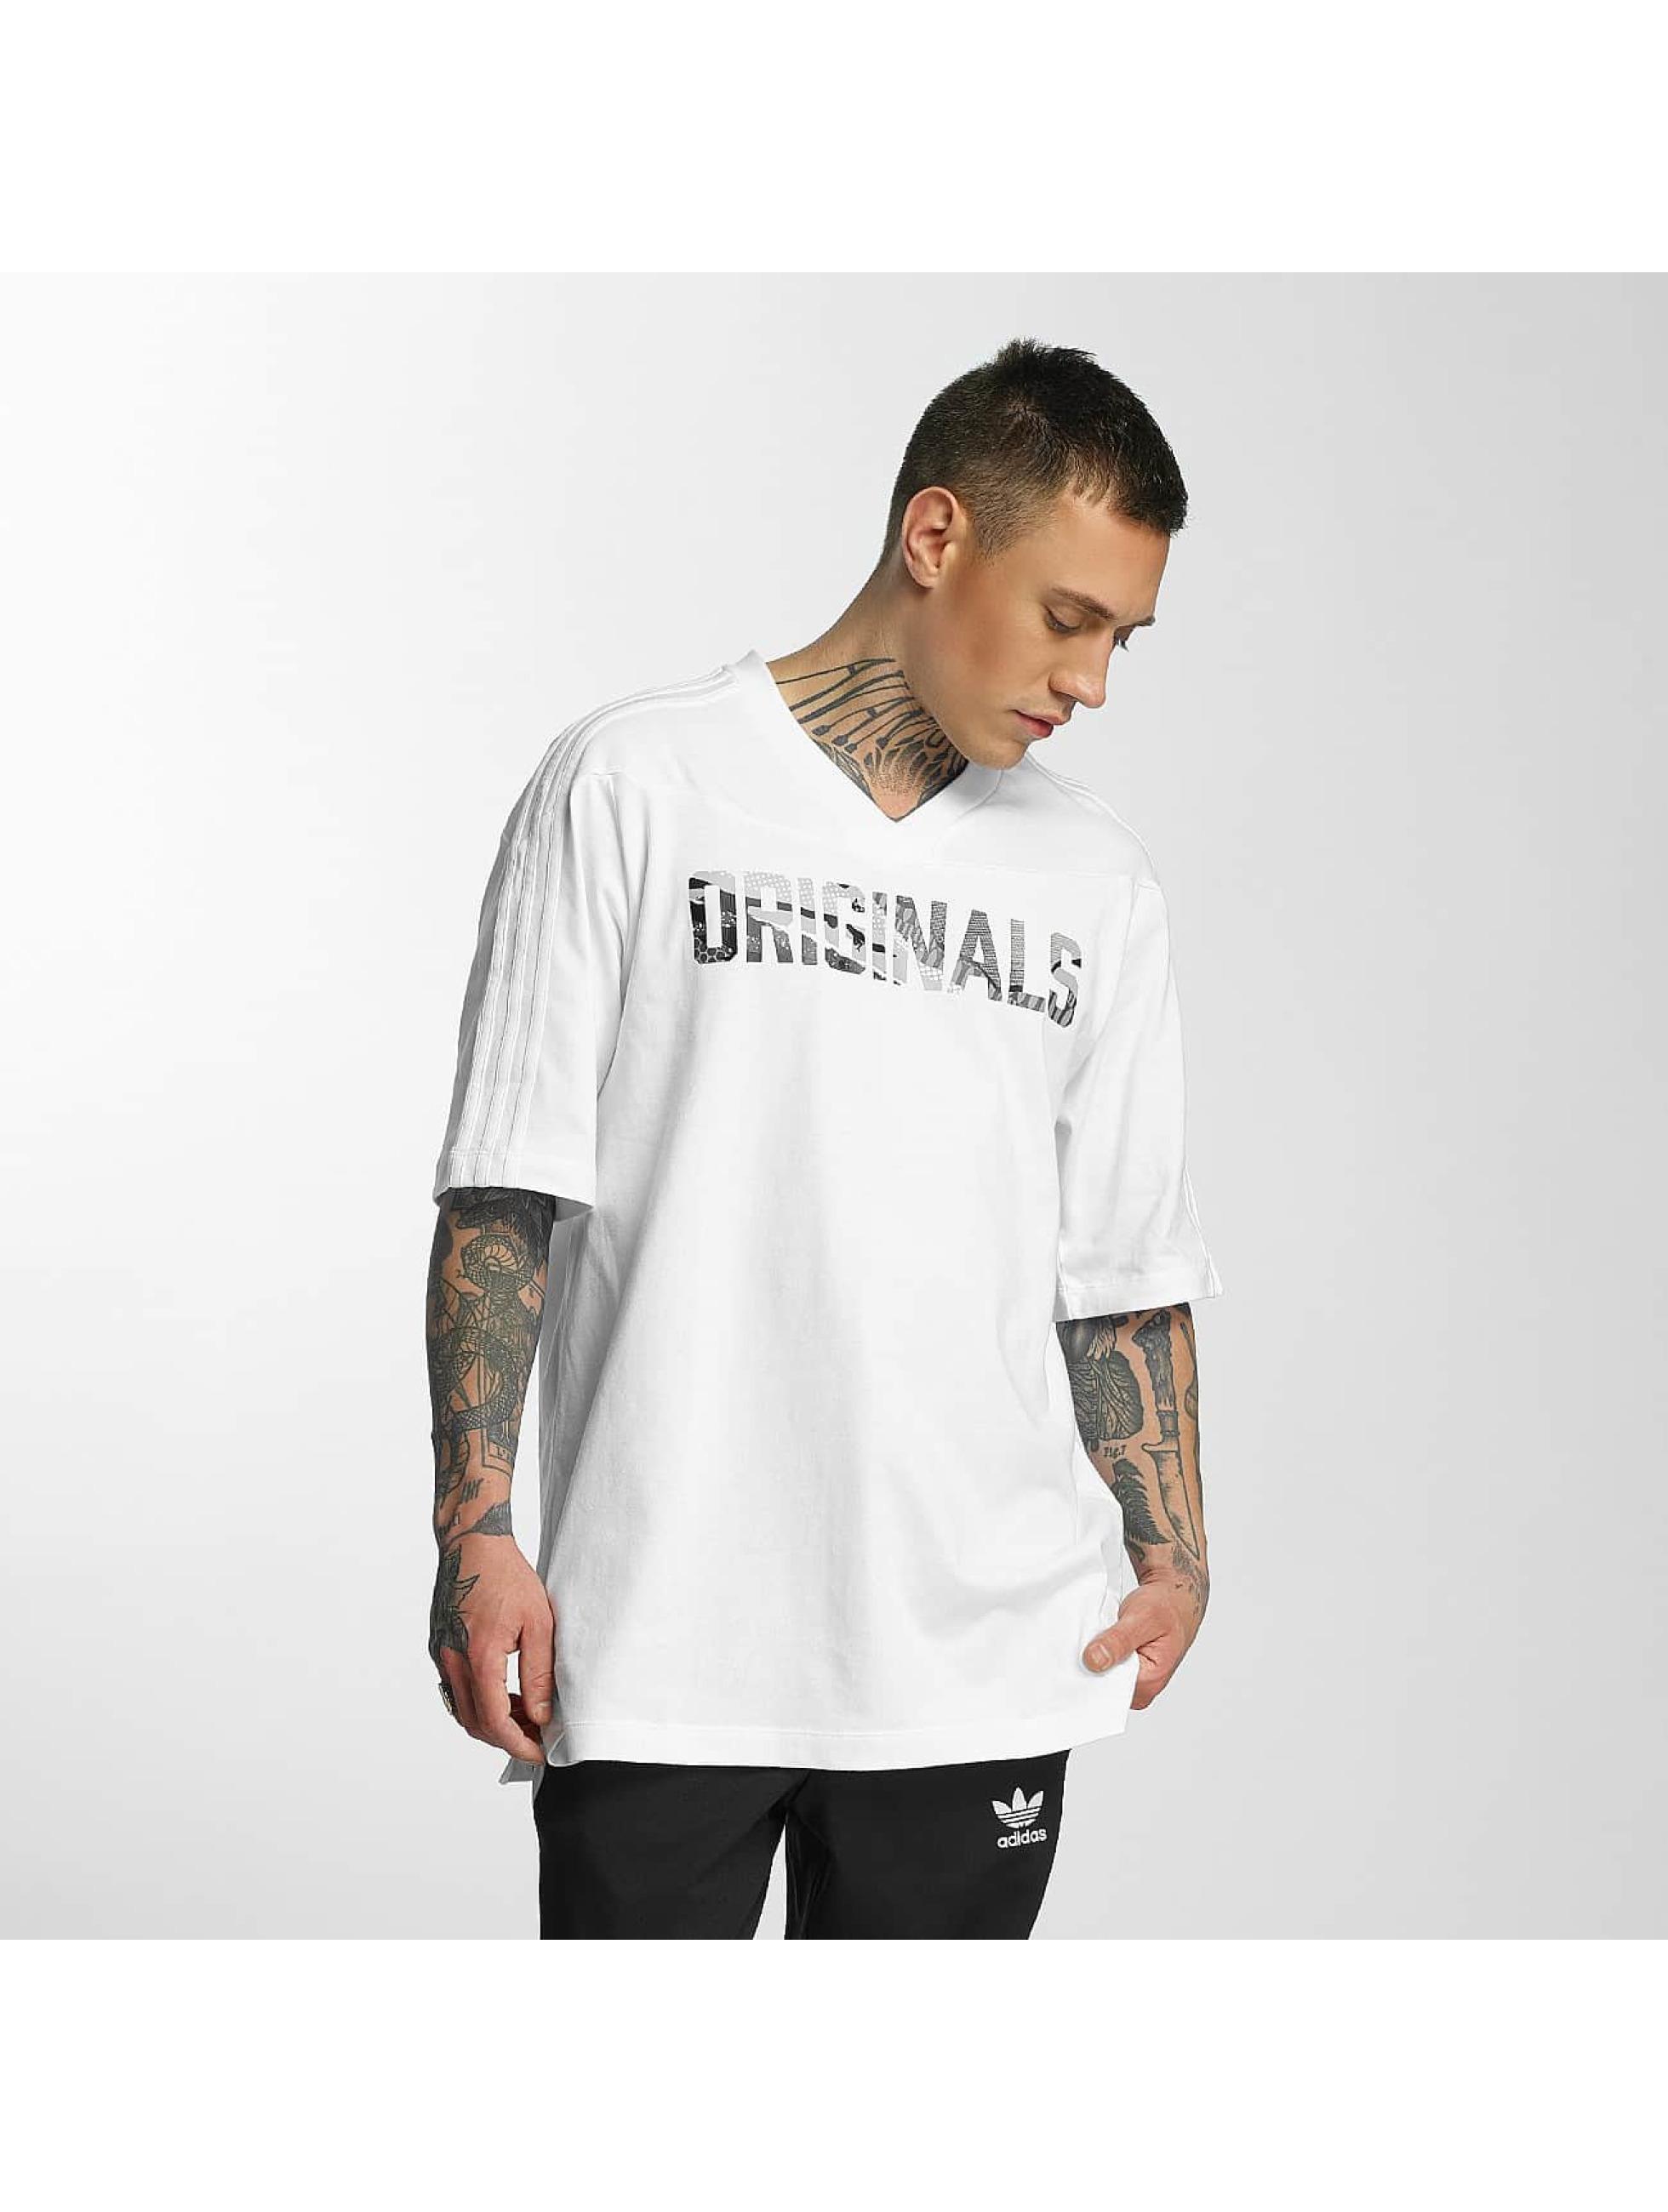 adidas Männer T-Shirt LA in weiß